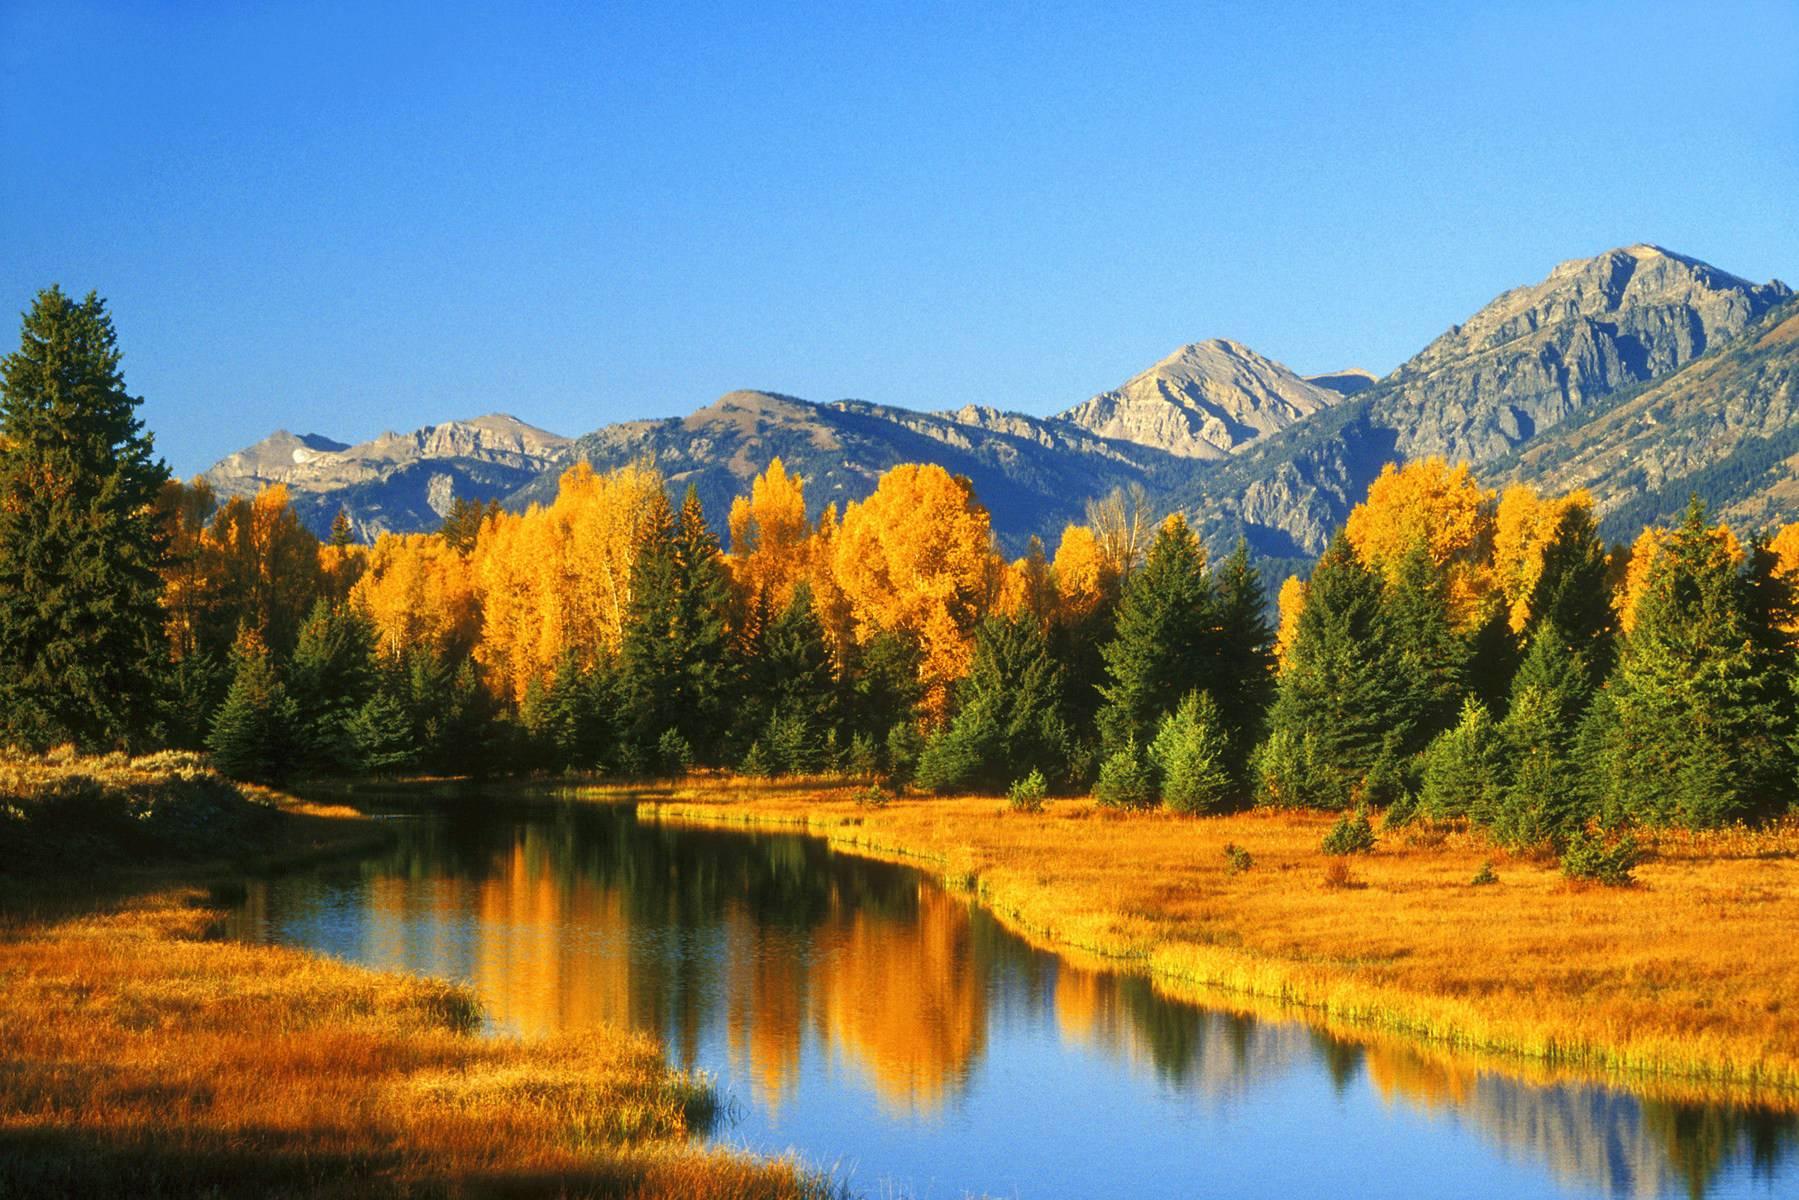 5-Day Yellowstone, Grand Teton and Salt Lake City Tour